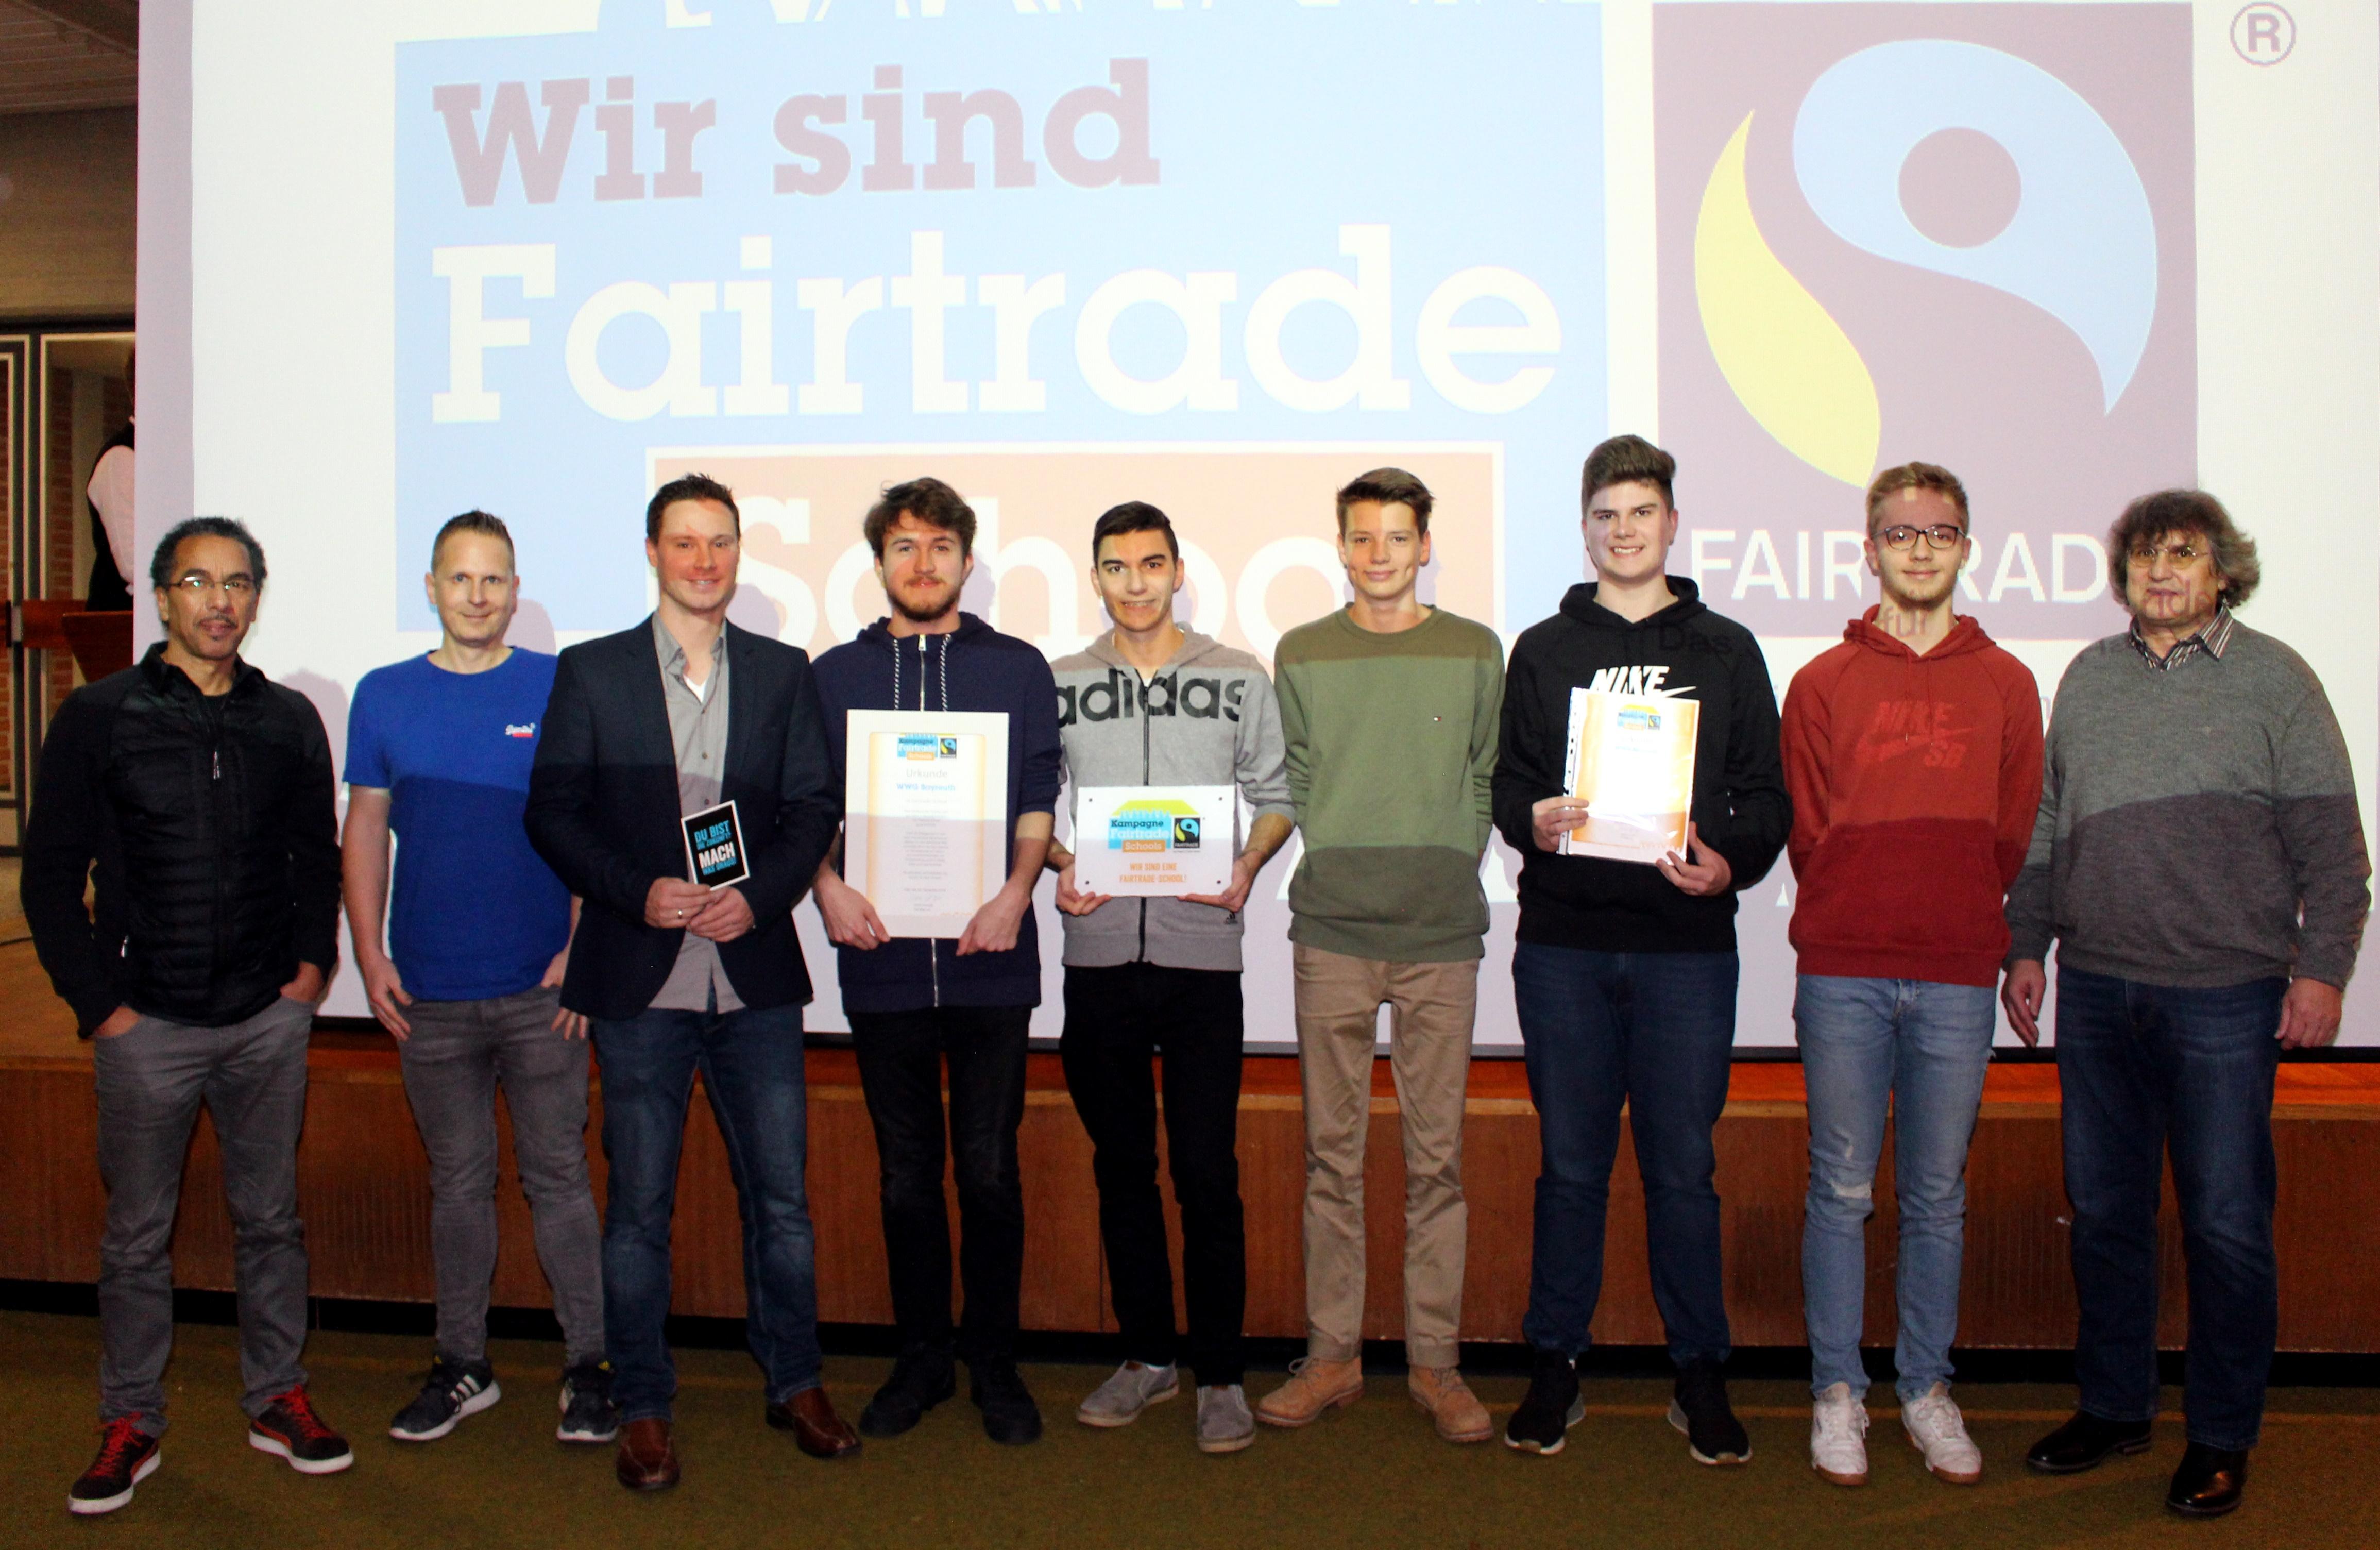 Blog - 201819 Fair Trade Schule Verleihungsfeier Bild 2